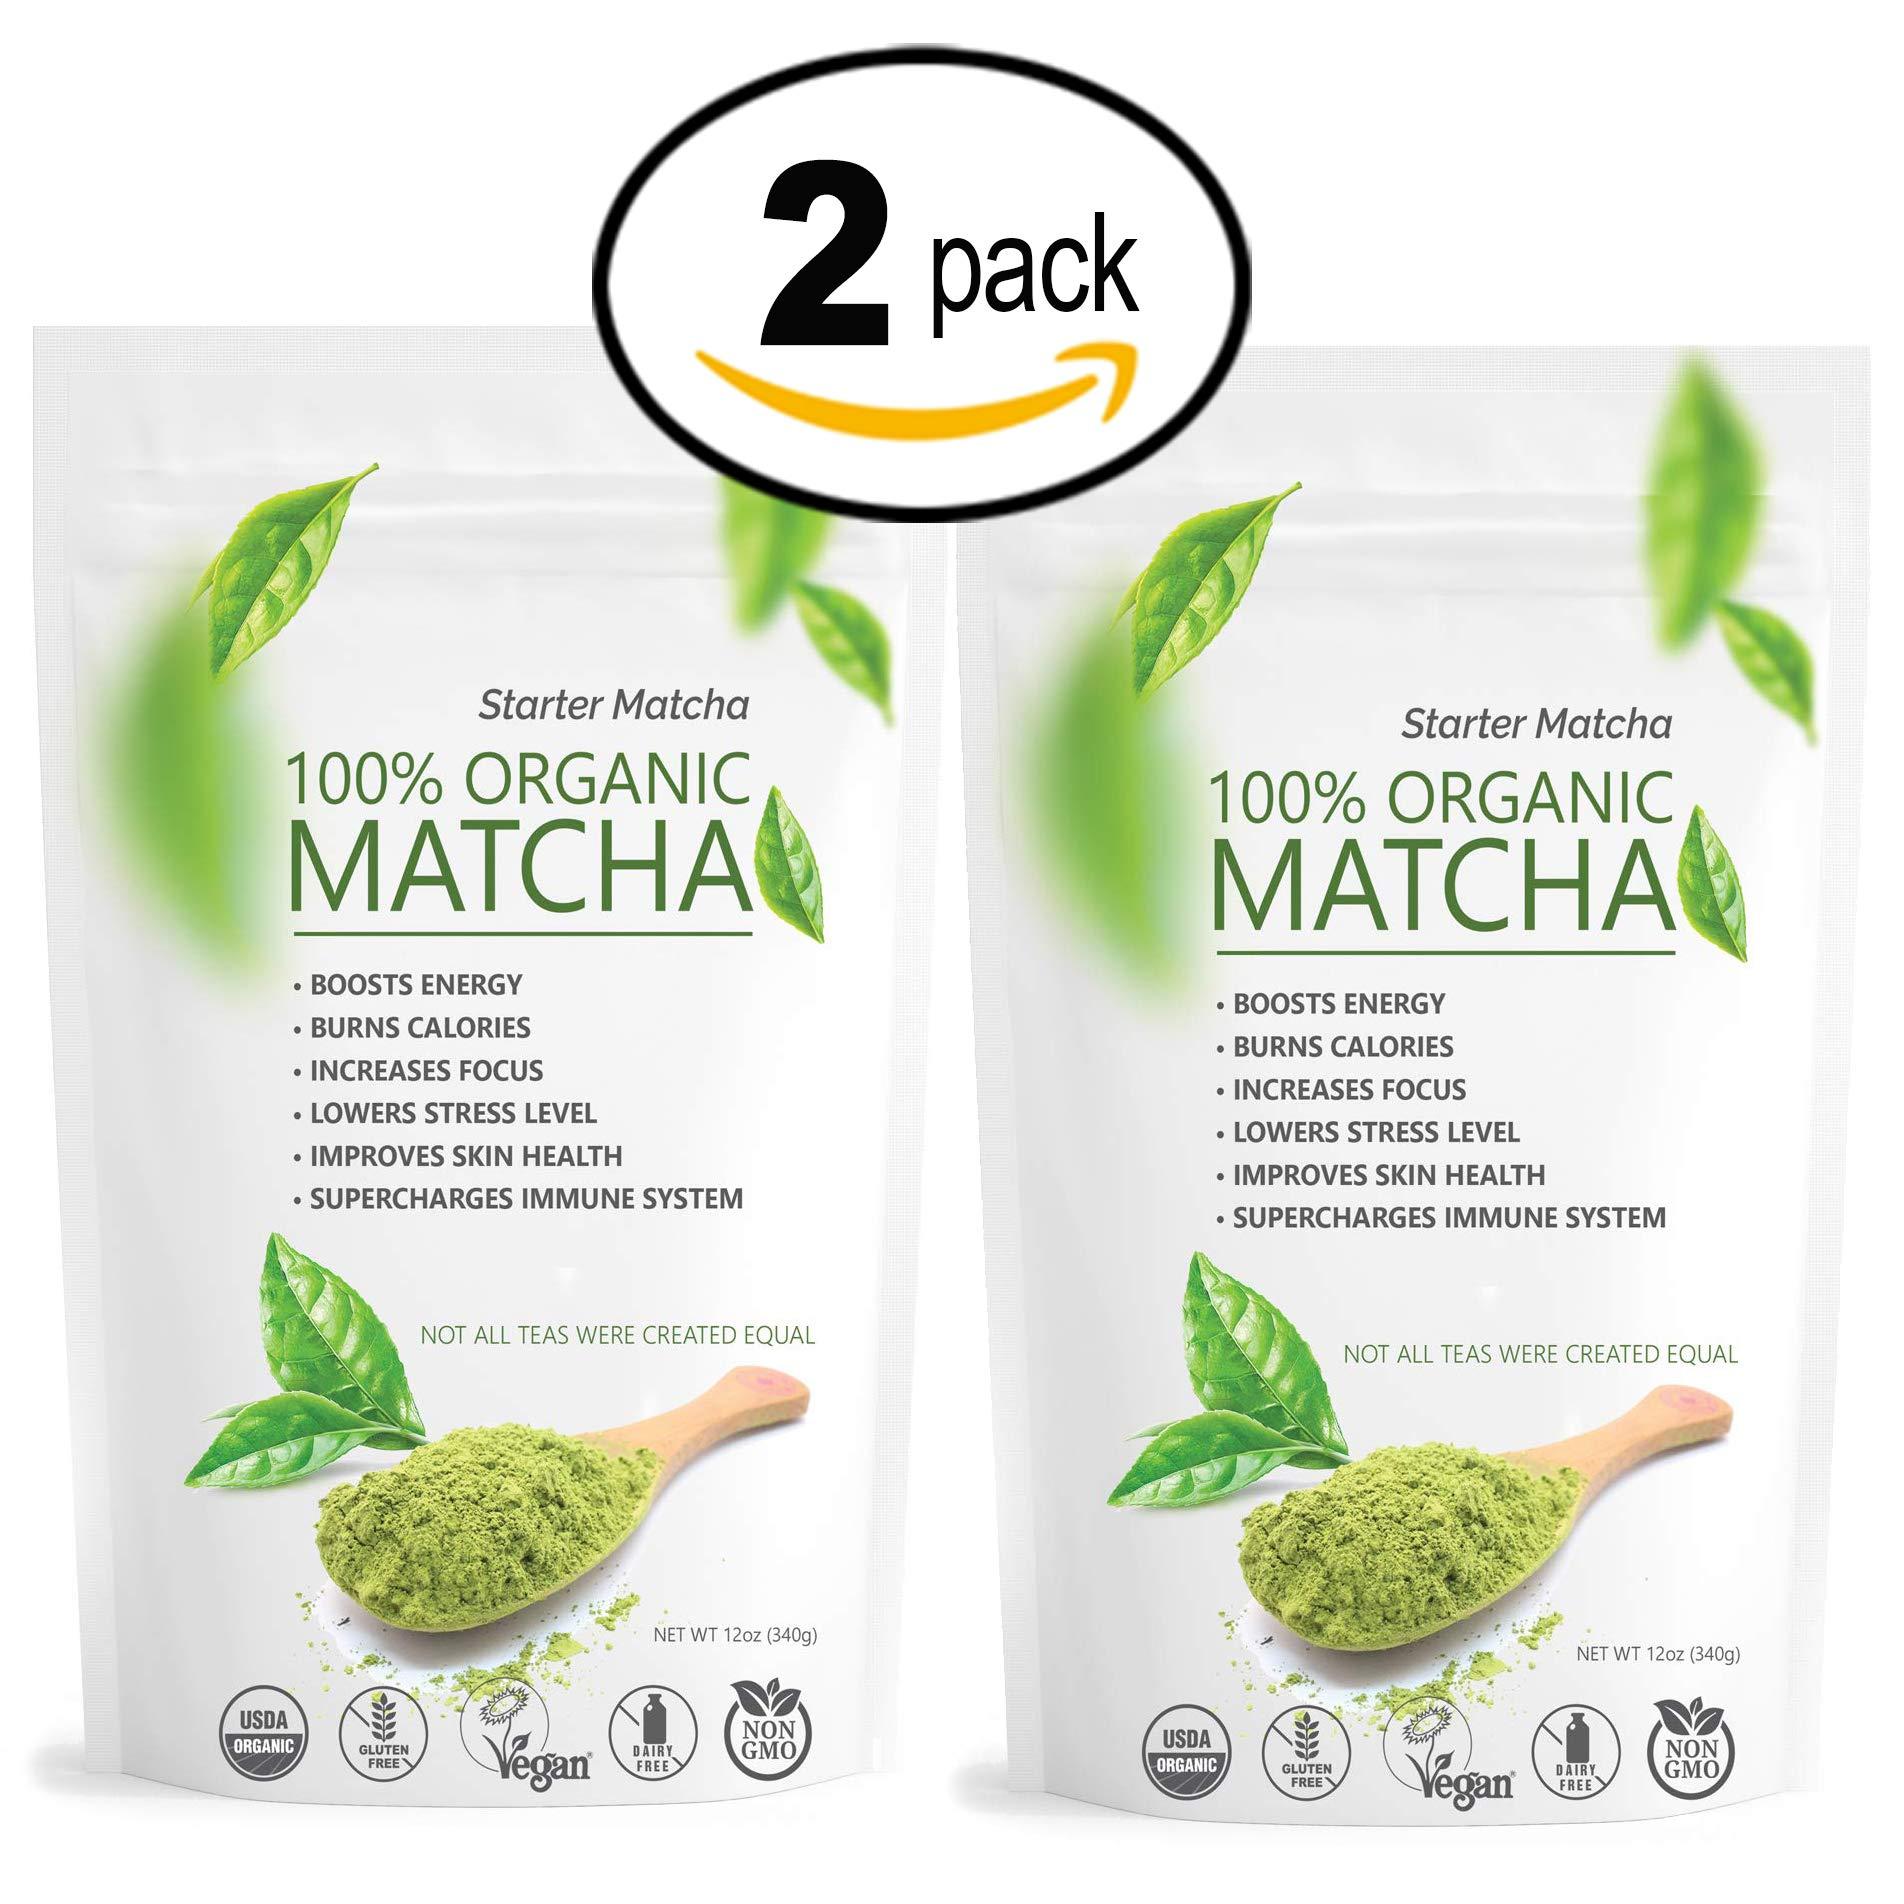 Starter Matcha Set | 2x 12oz | USDA Organic | Non-GMO Certified | Vegan and Gluten-Free | Pure Matcha Green Tea Powder | Grassy Flavor | Mild Natural Bitterness | Autumn-Green color | Matcha Outlet